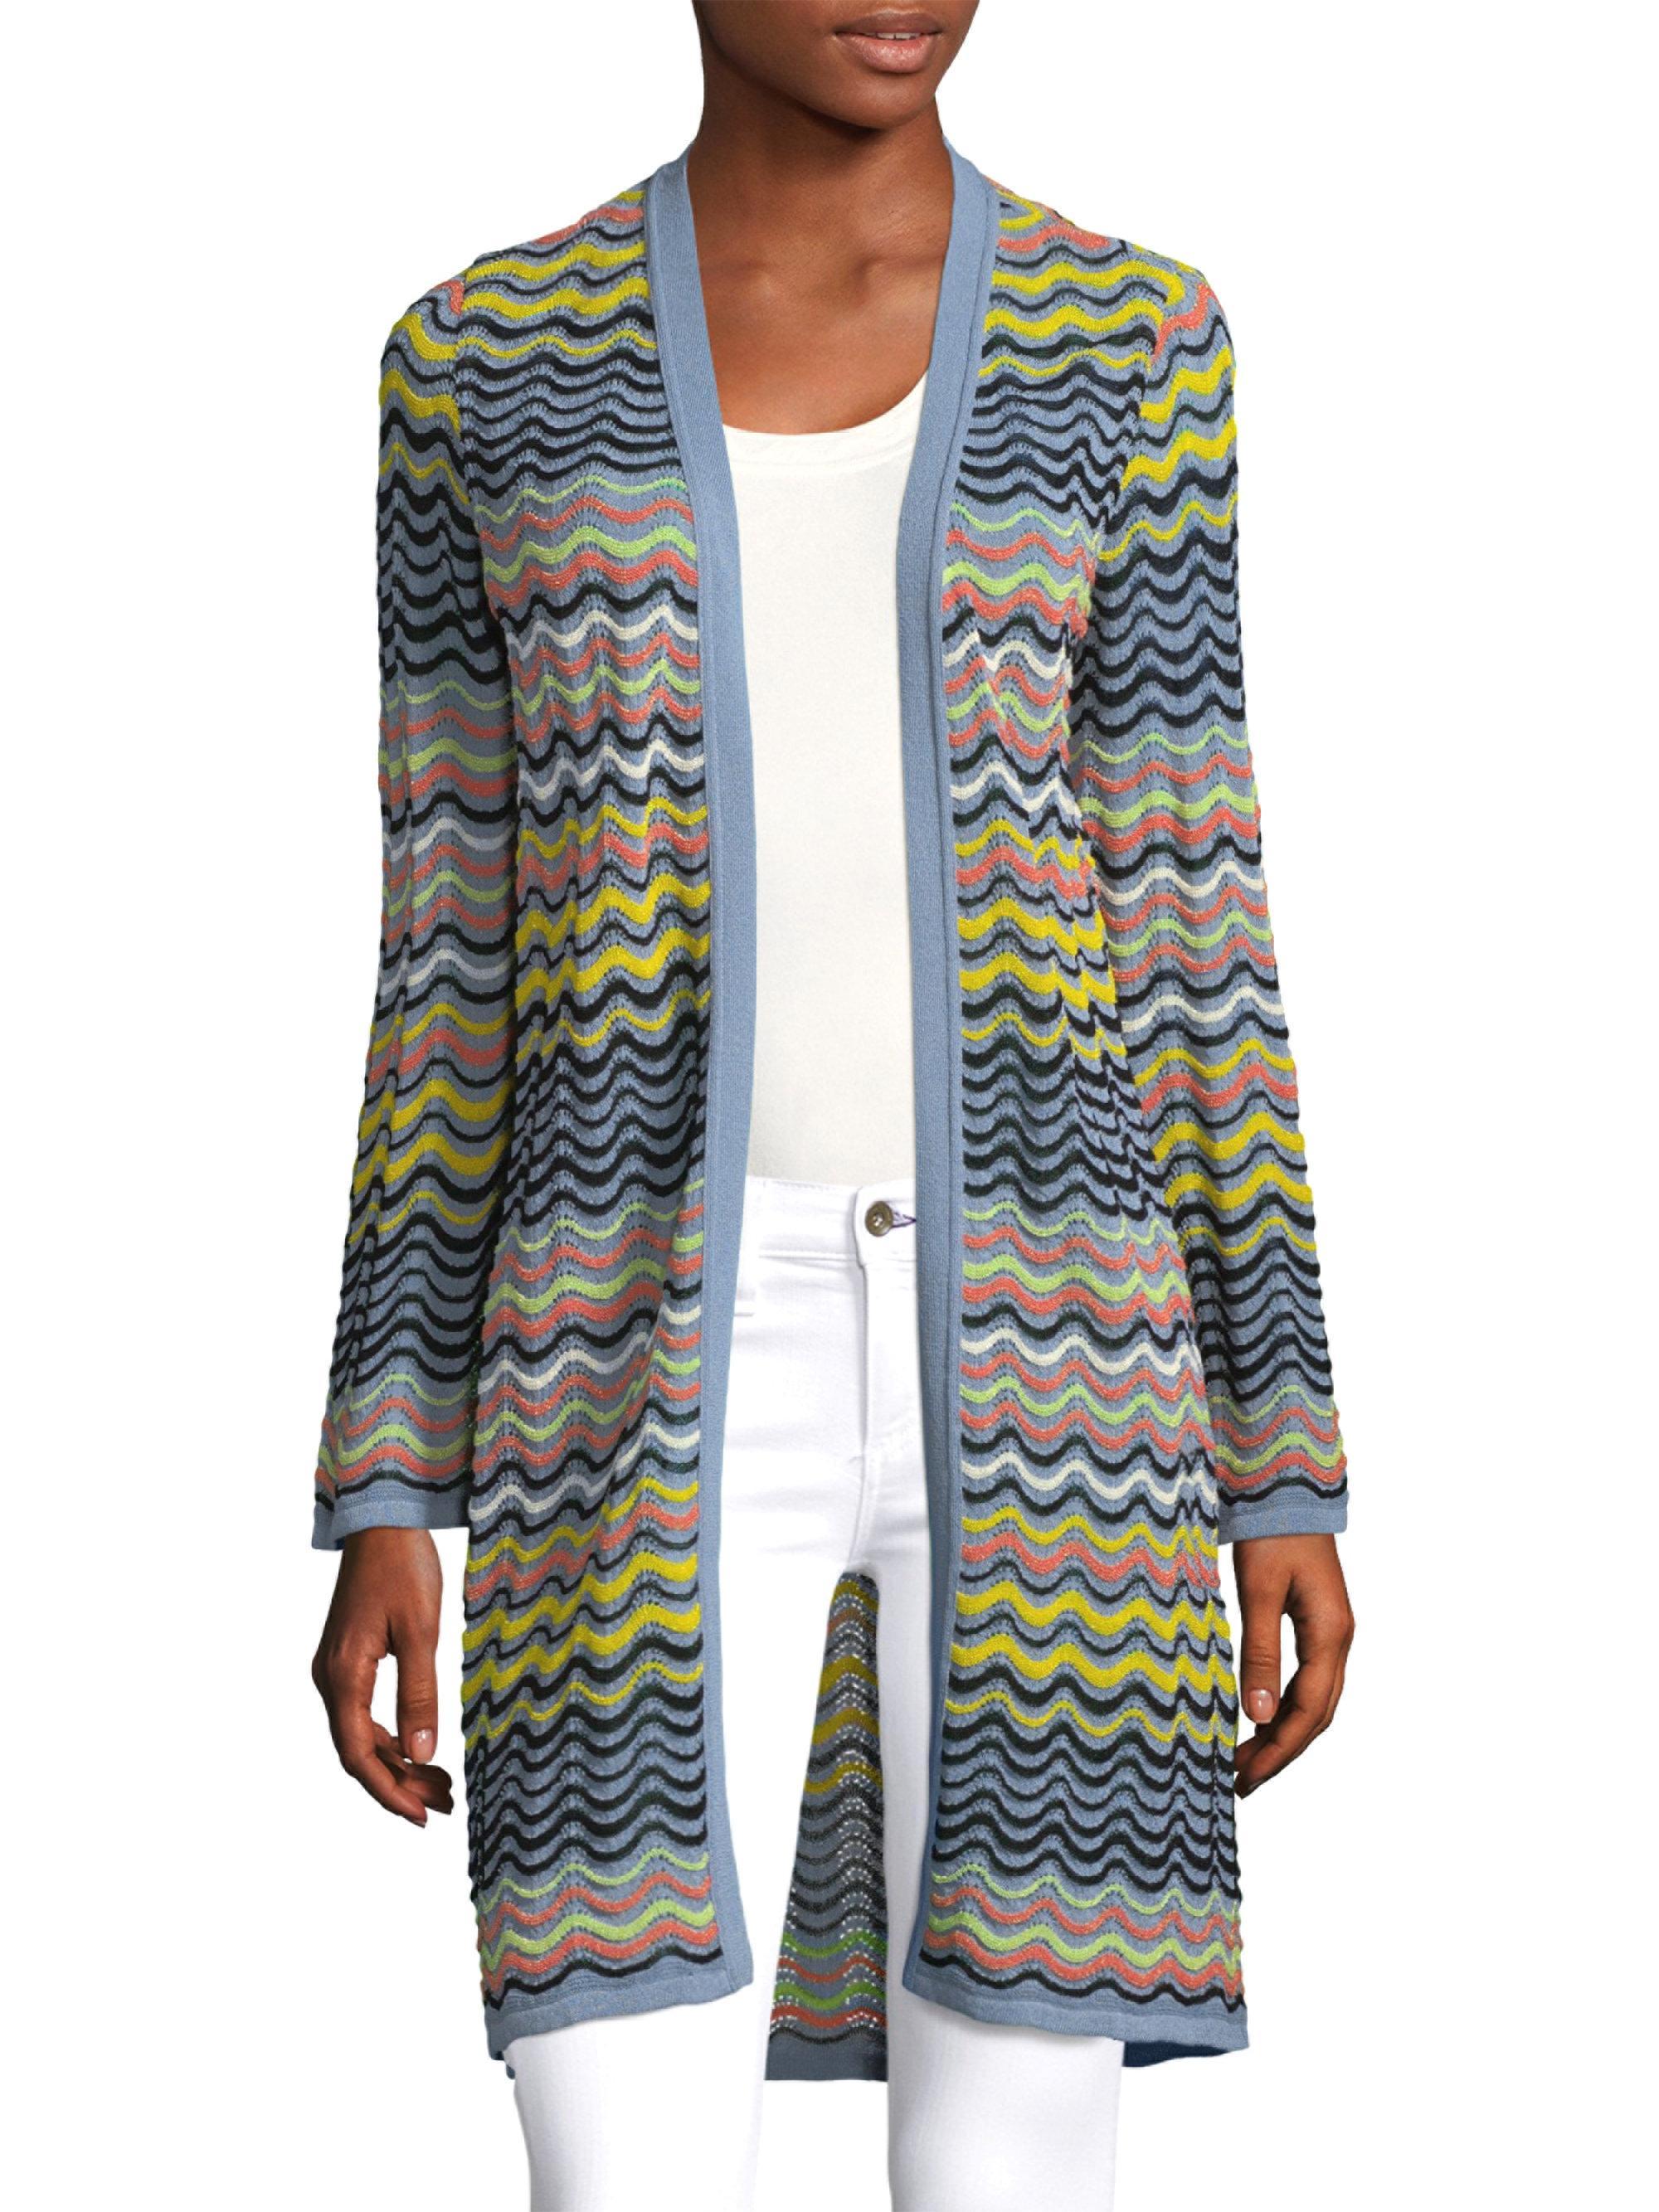 M Missoni. Women's Gray Wave Ripple Knit Cardigan